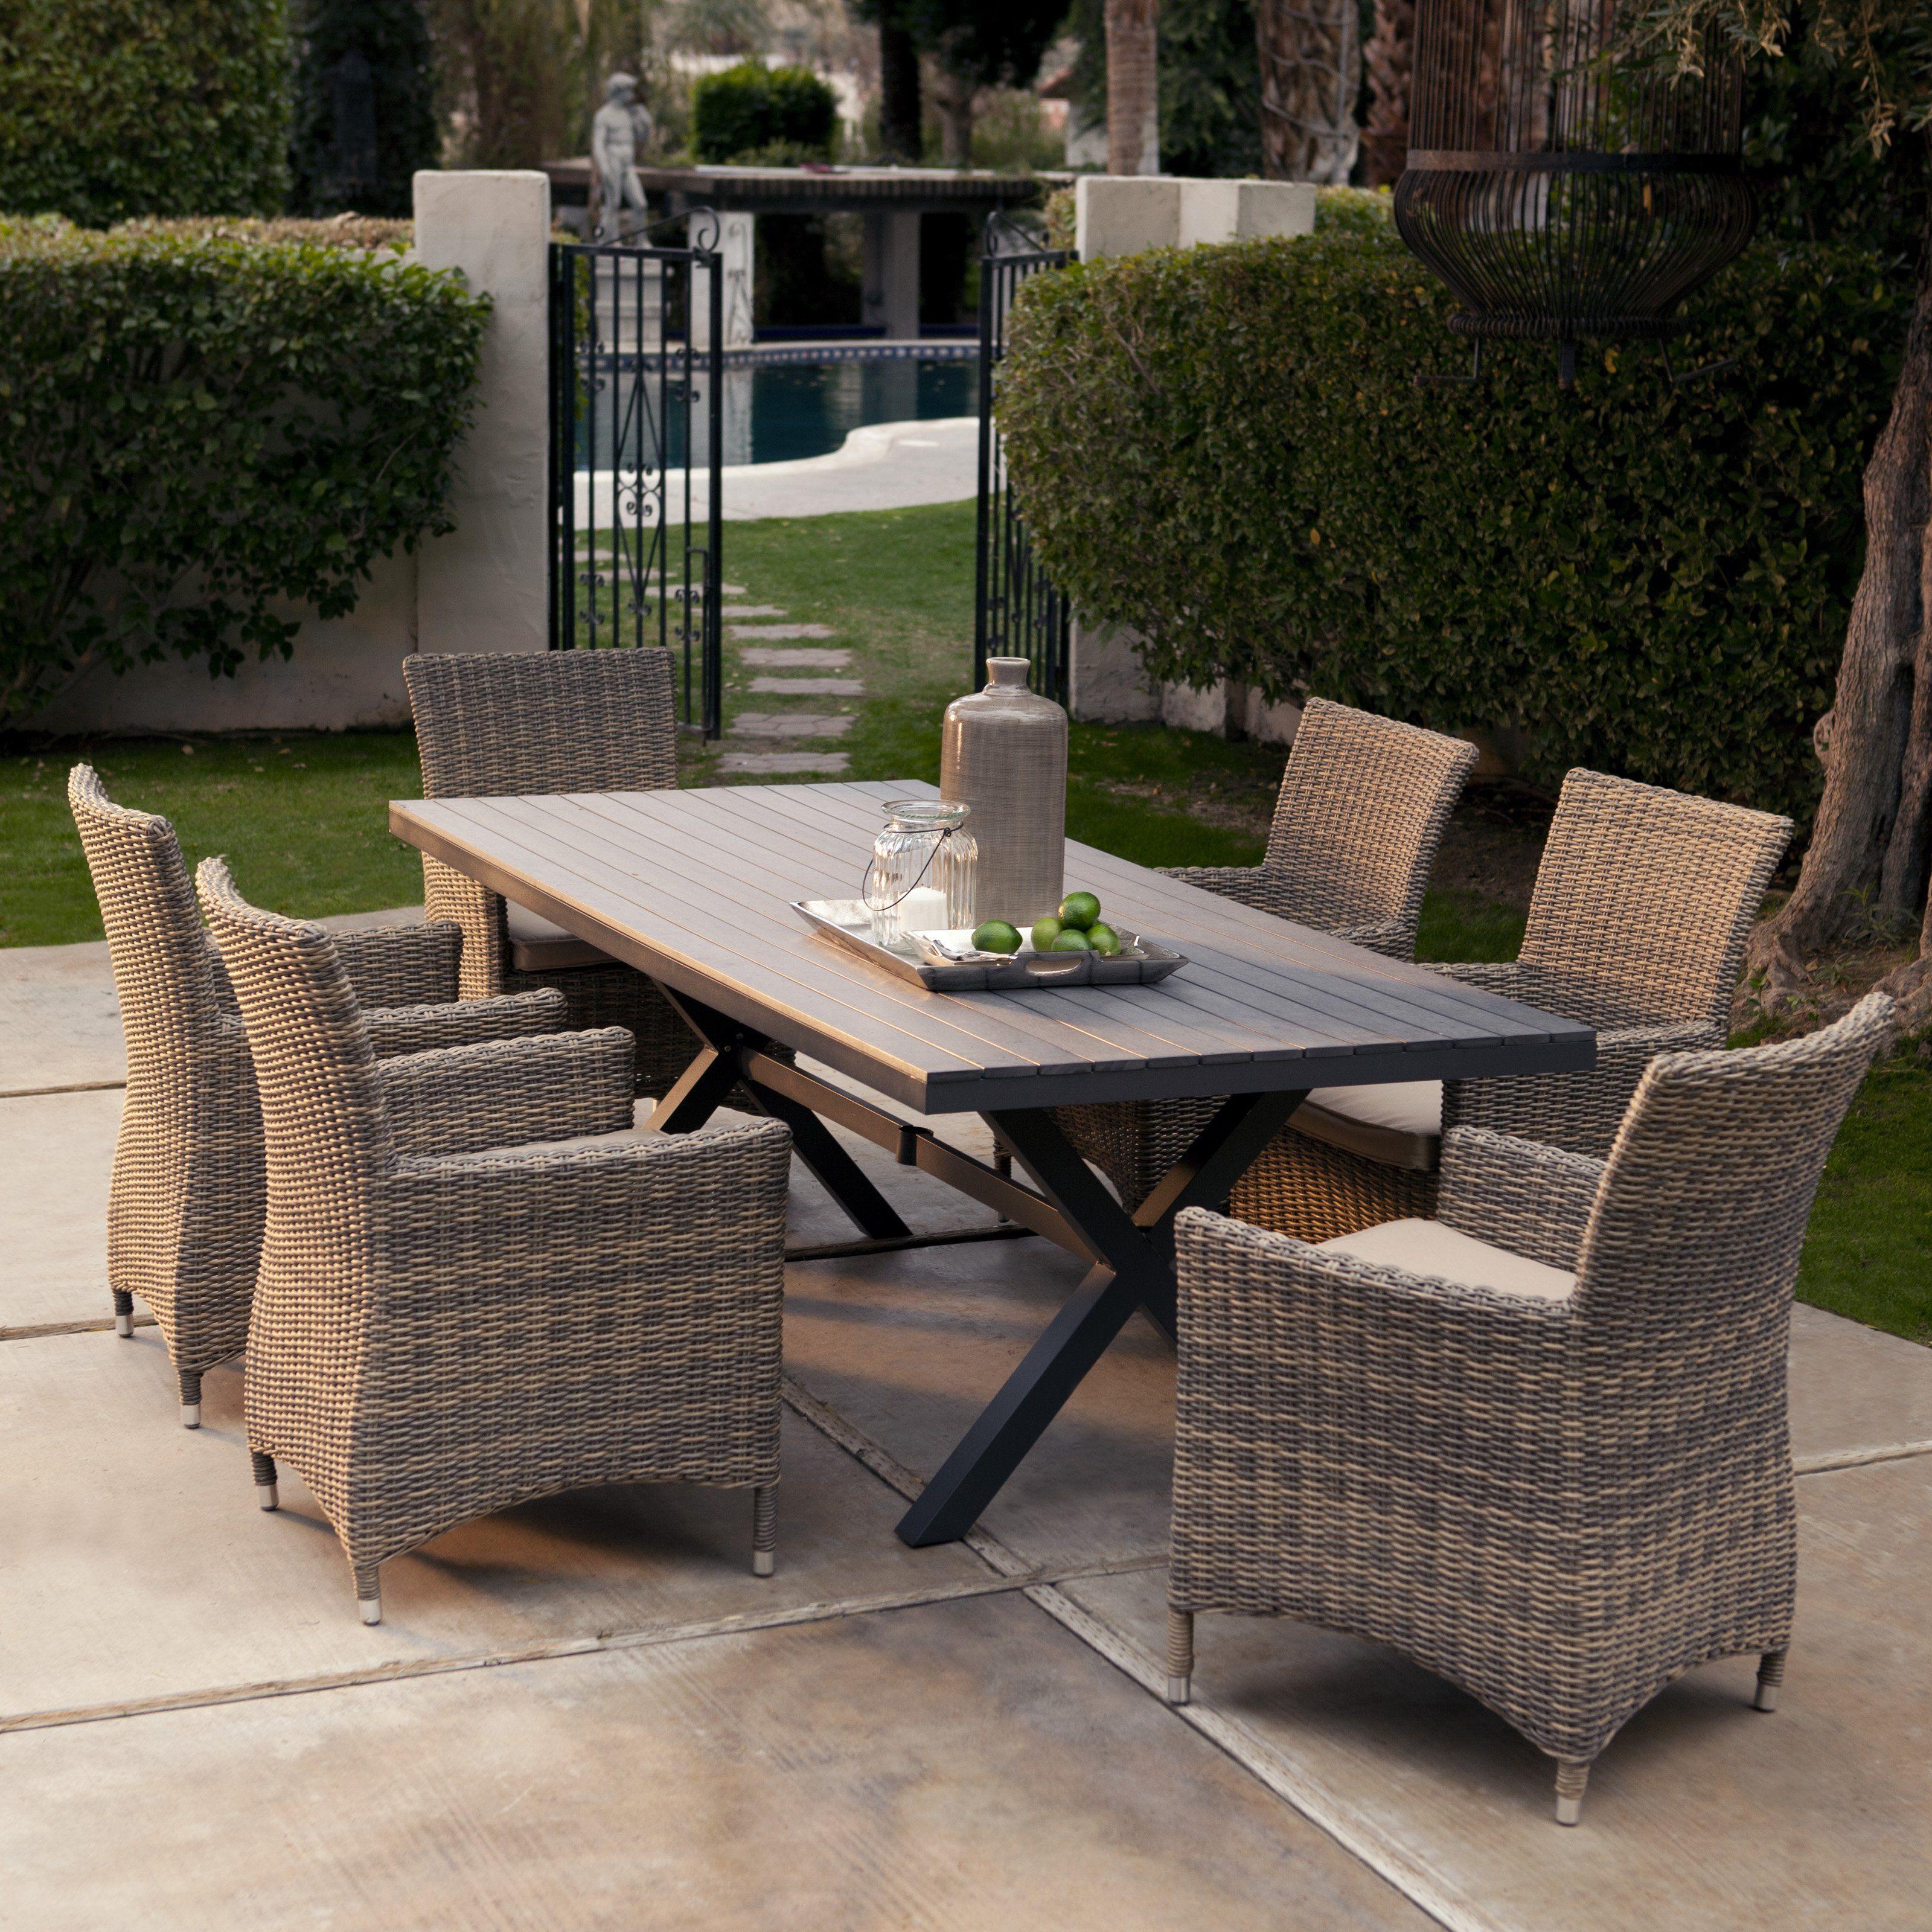 15 outdoor patio furniture ideas in